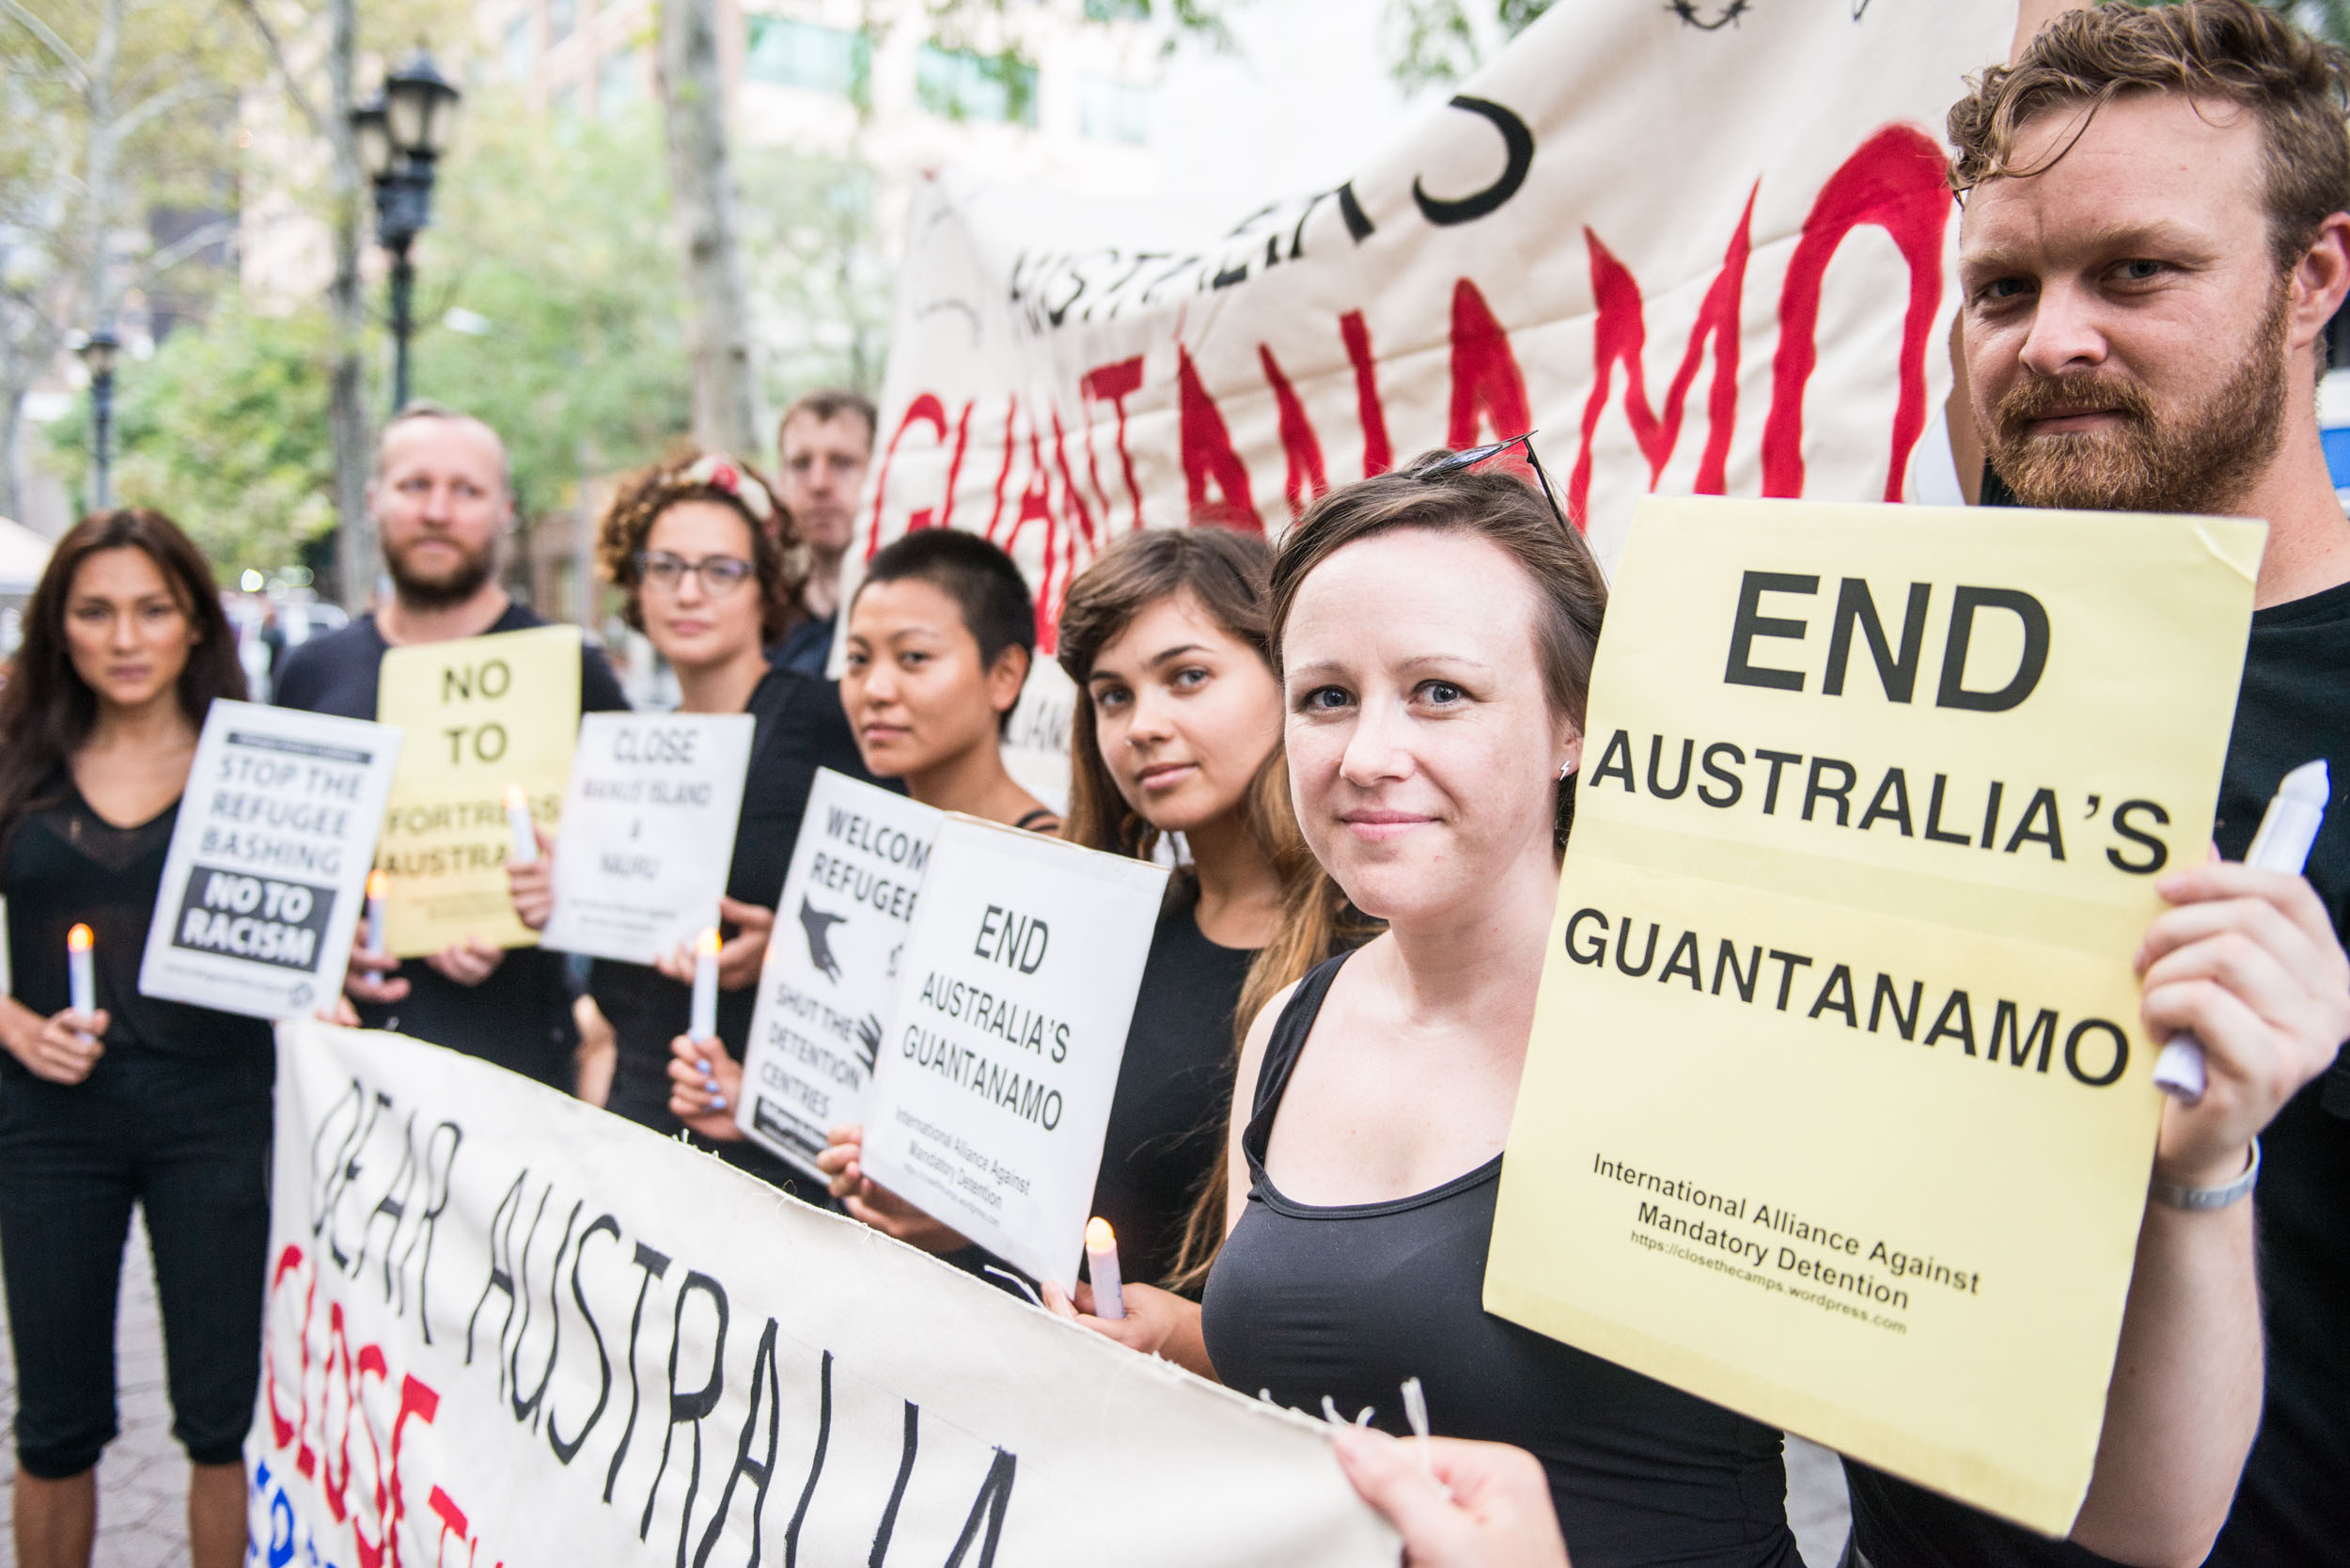 Guantanamo protest - Current events - Photo credit Nicola Bailey.jpg